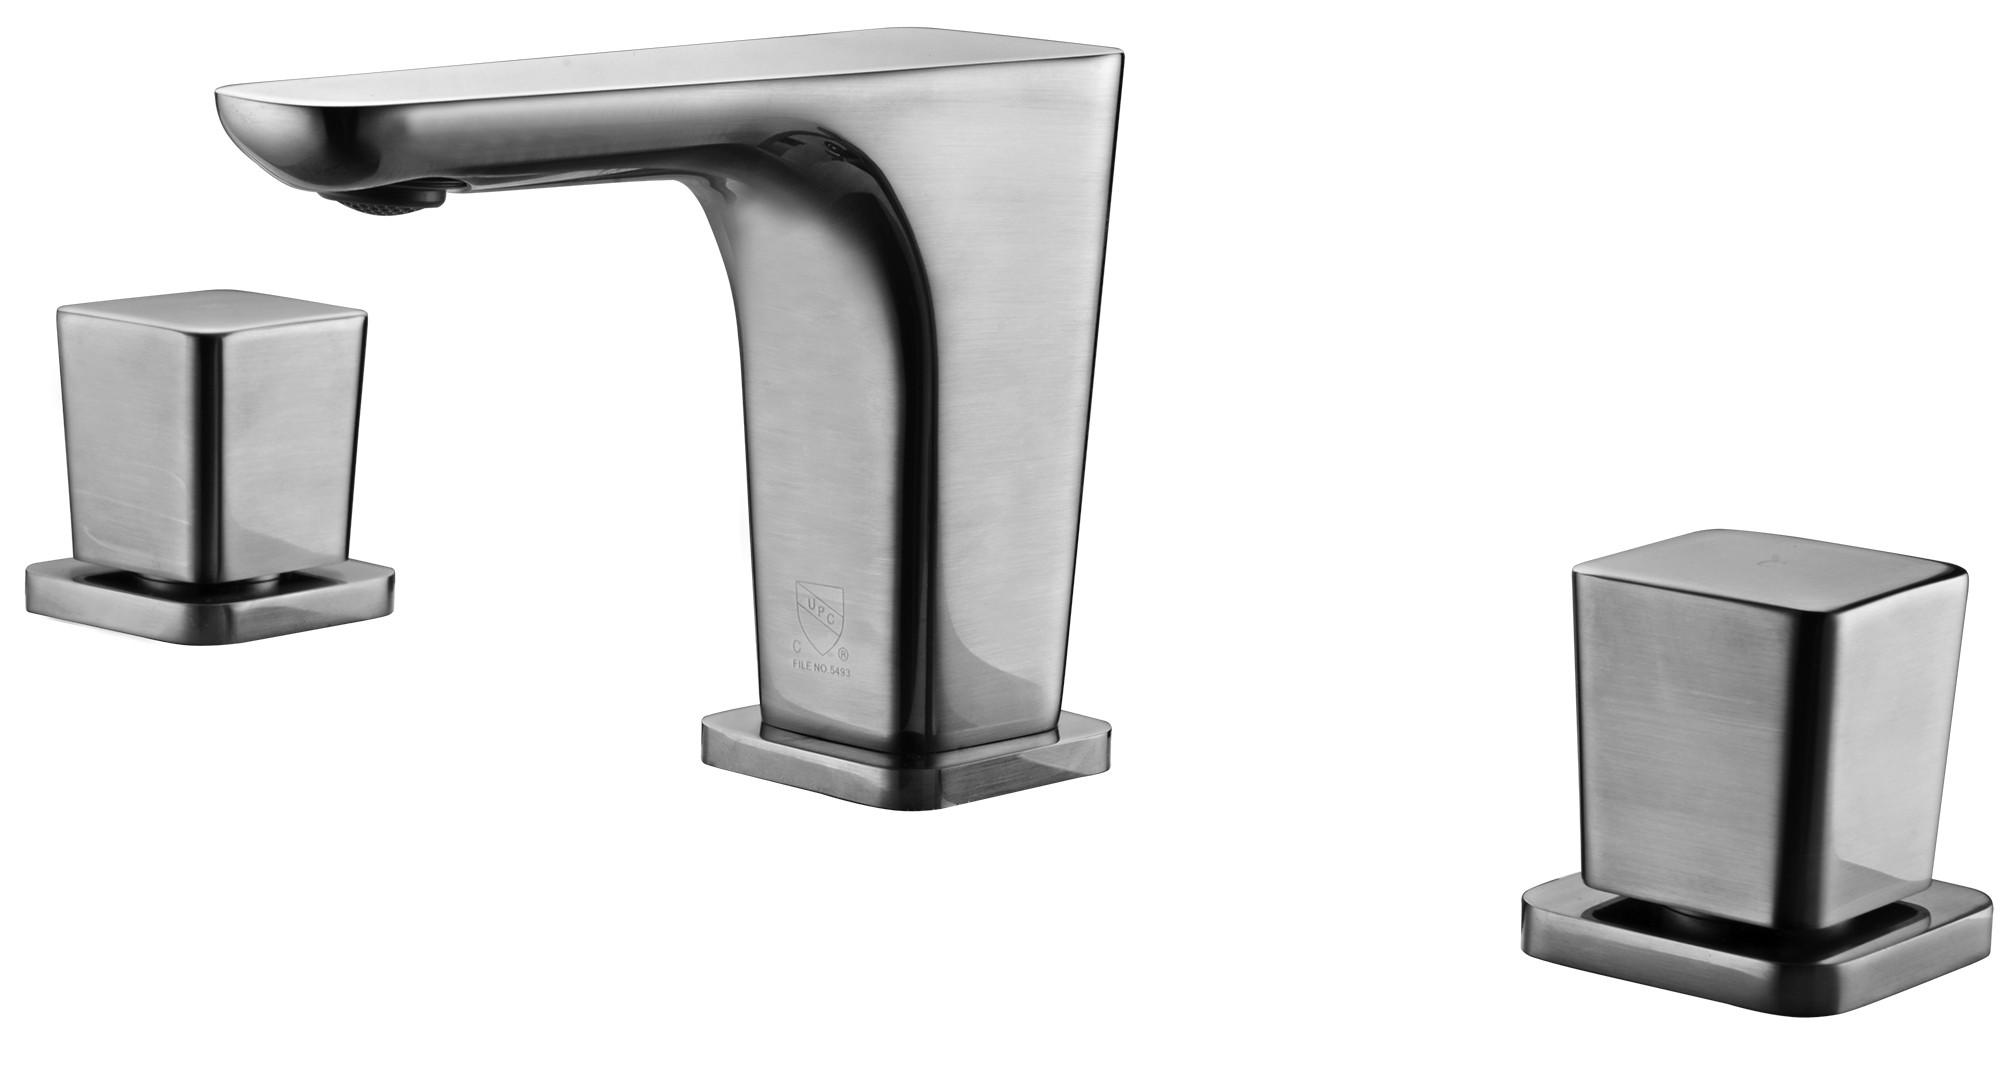 ALFI brand AB1782-BN Brushed Nickel Widespread Modern Bathroom Faucet